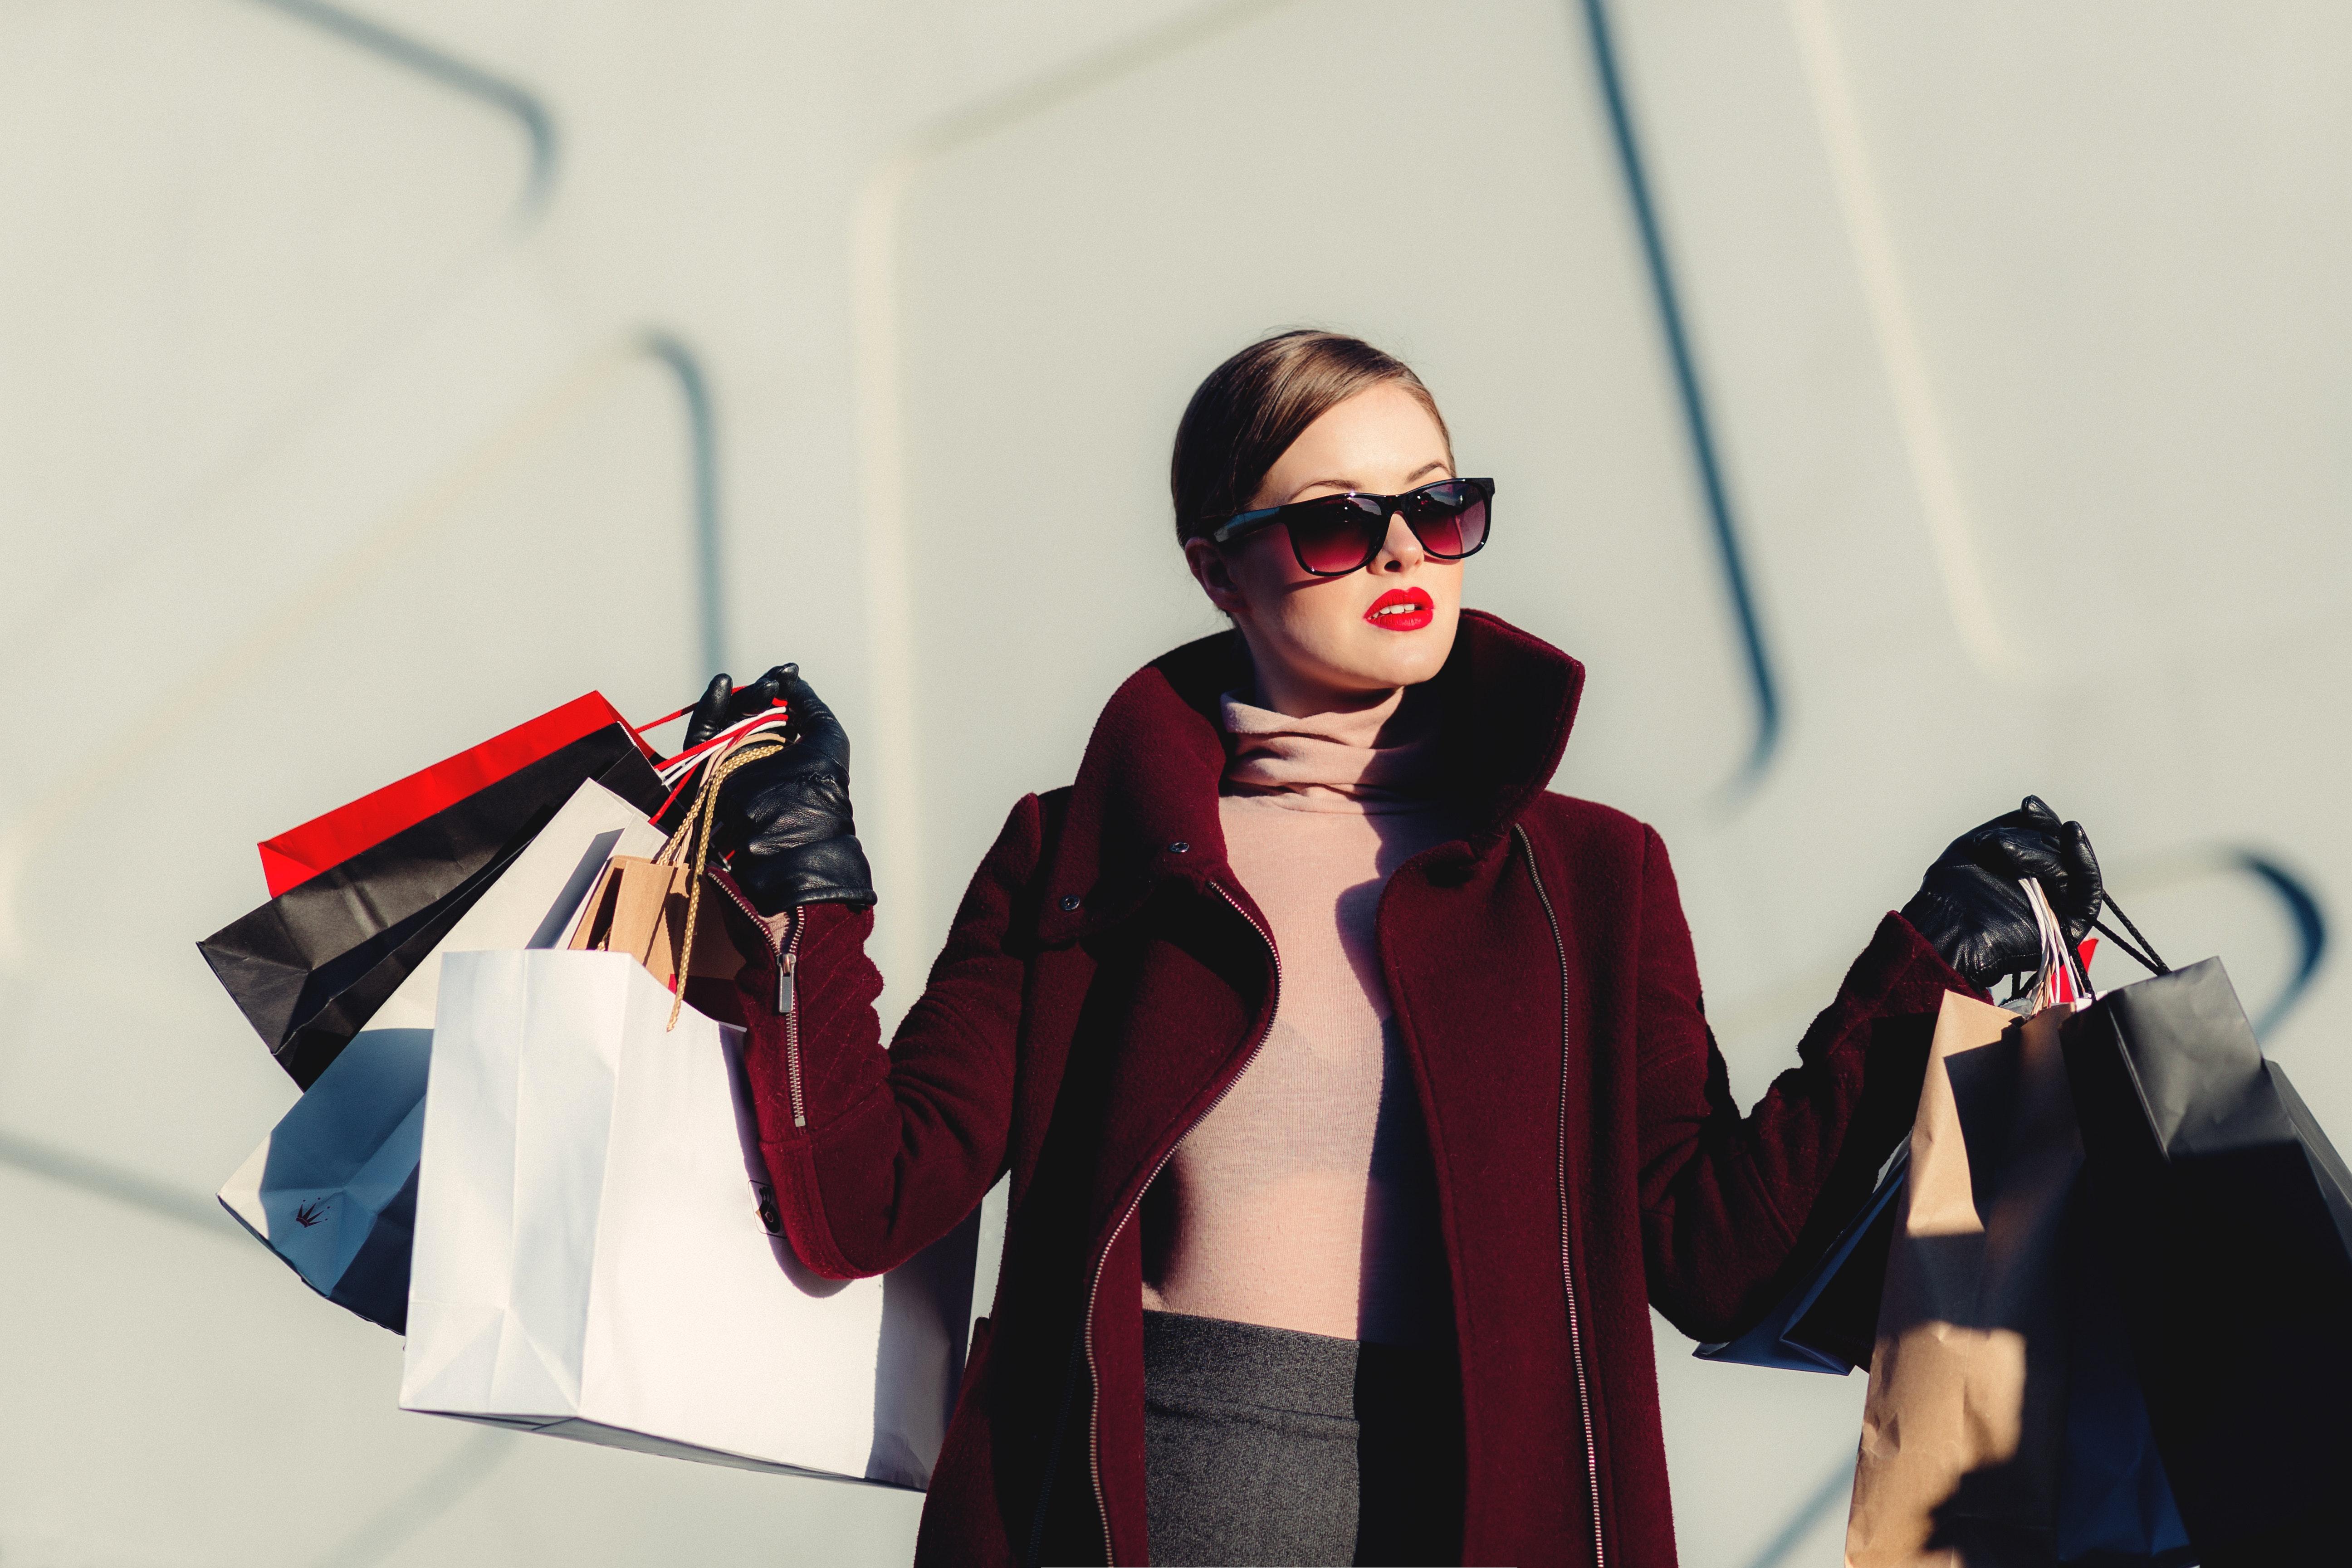 01a7ef5227df 50代におすすめのファッションブランドは?おすすめ人気ランキングを紹介 ...